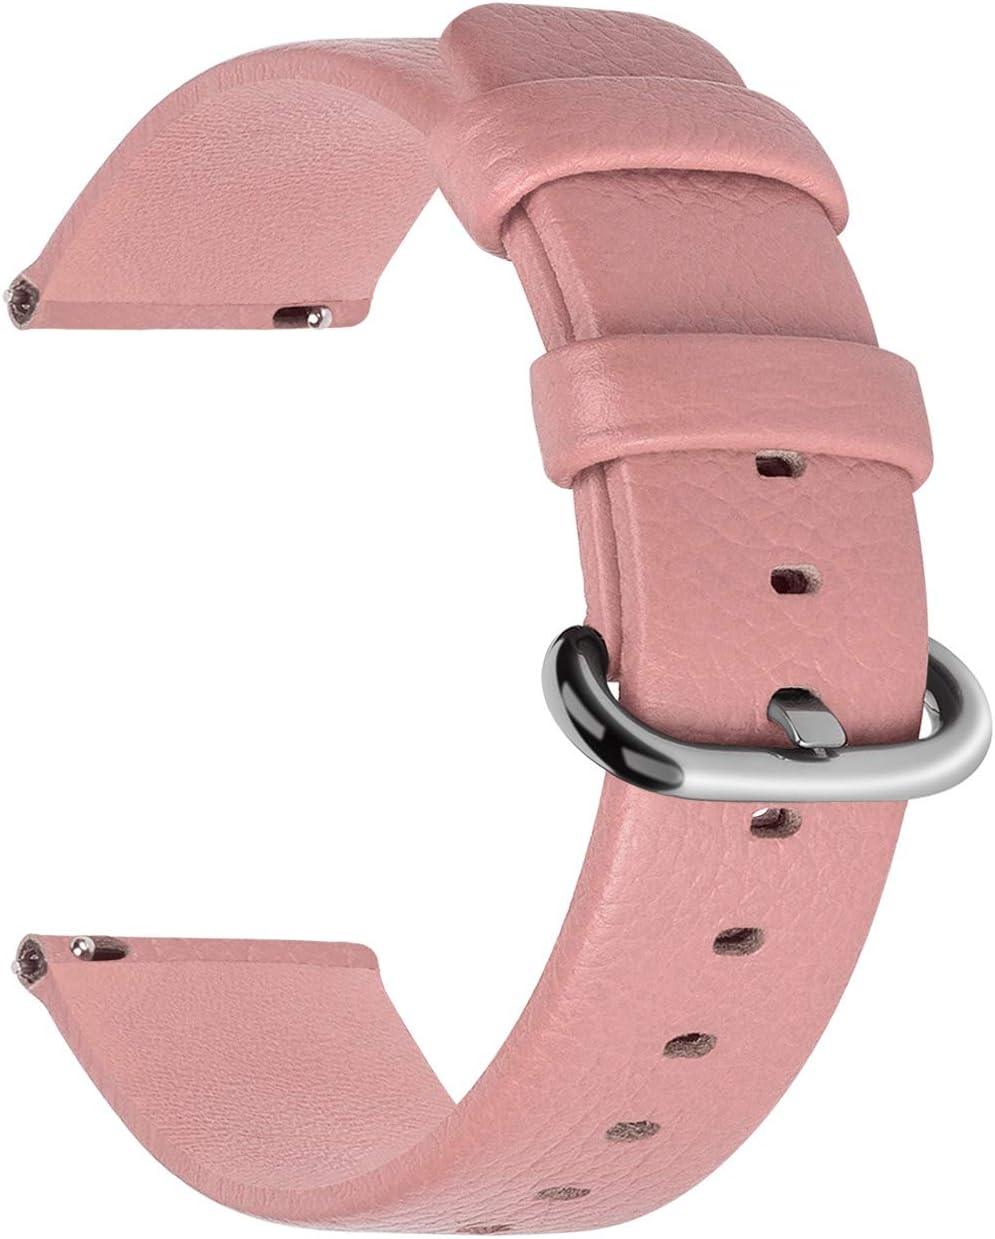 Fullmosa Uli Piel Correa Reloj, 12 Colores para Correa/Banda/Pulsera/Strap Reloj Huawei/Samsung/Recambio/Reemplazo 18mm 20mm 22mm 24mm, Rosa 18mm